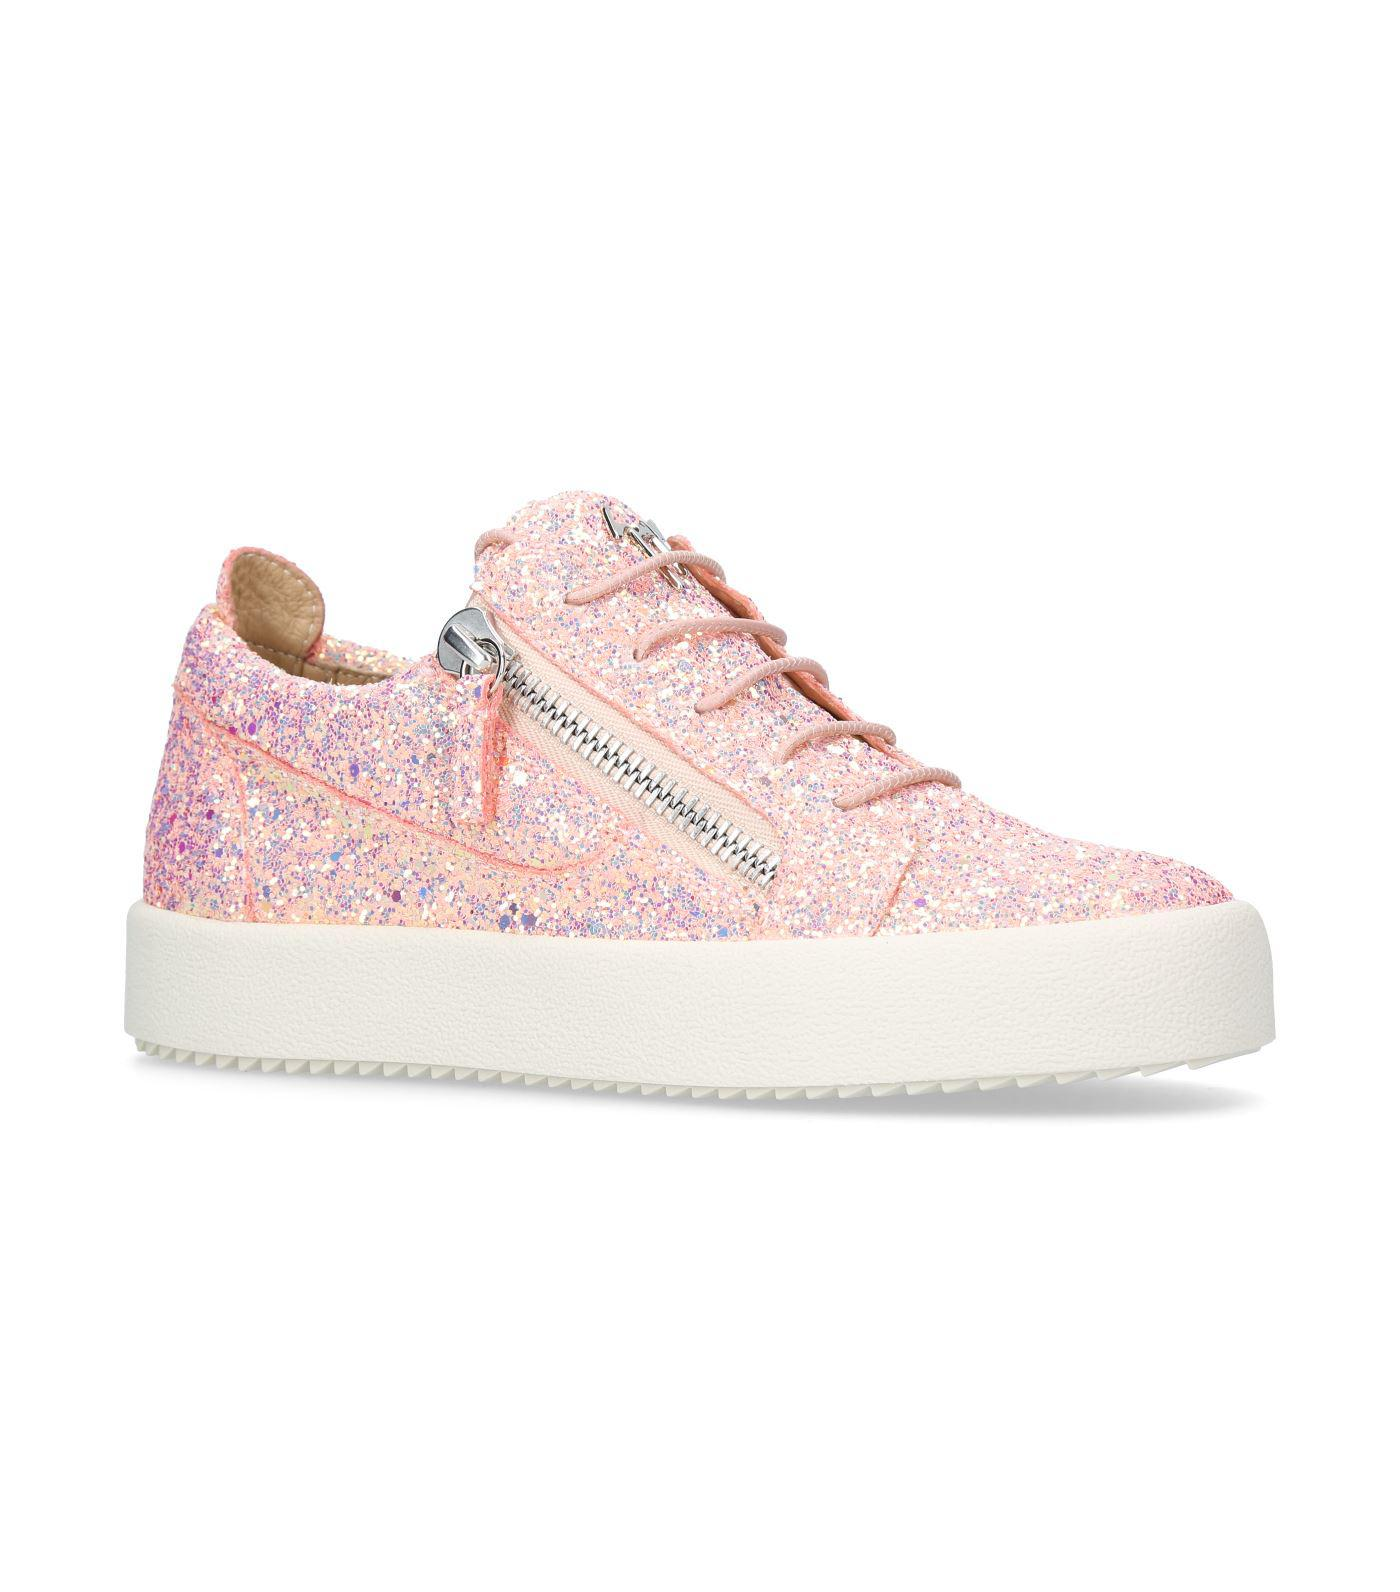 a84b8b166a0d9 Giuseppe Zanotti Glitter Cheryl Low-top Sneakers in Pink - Lyst